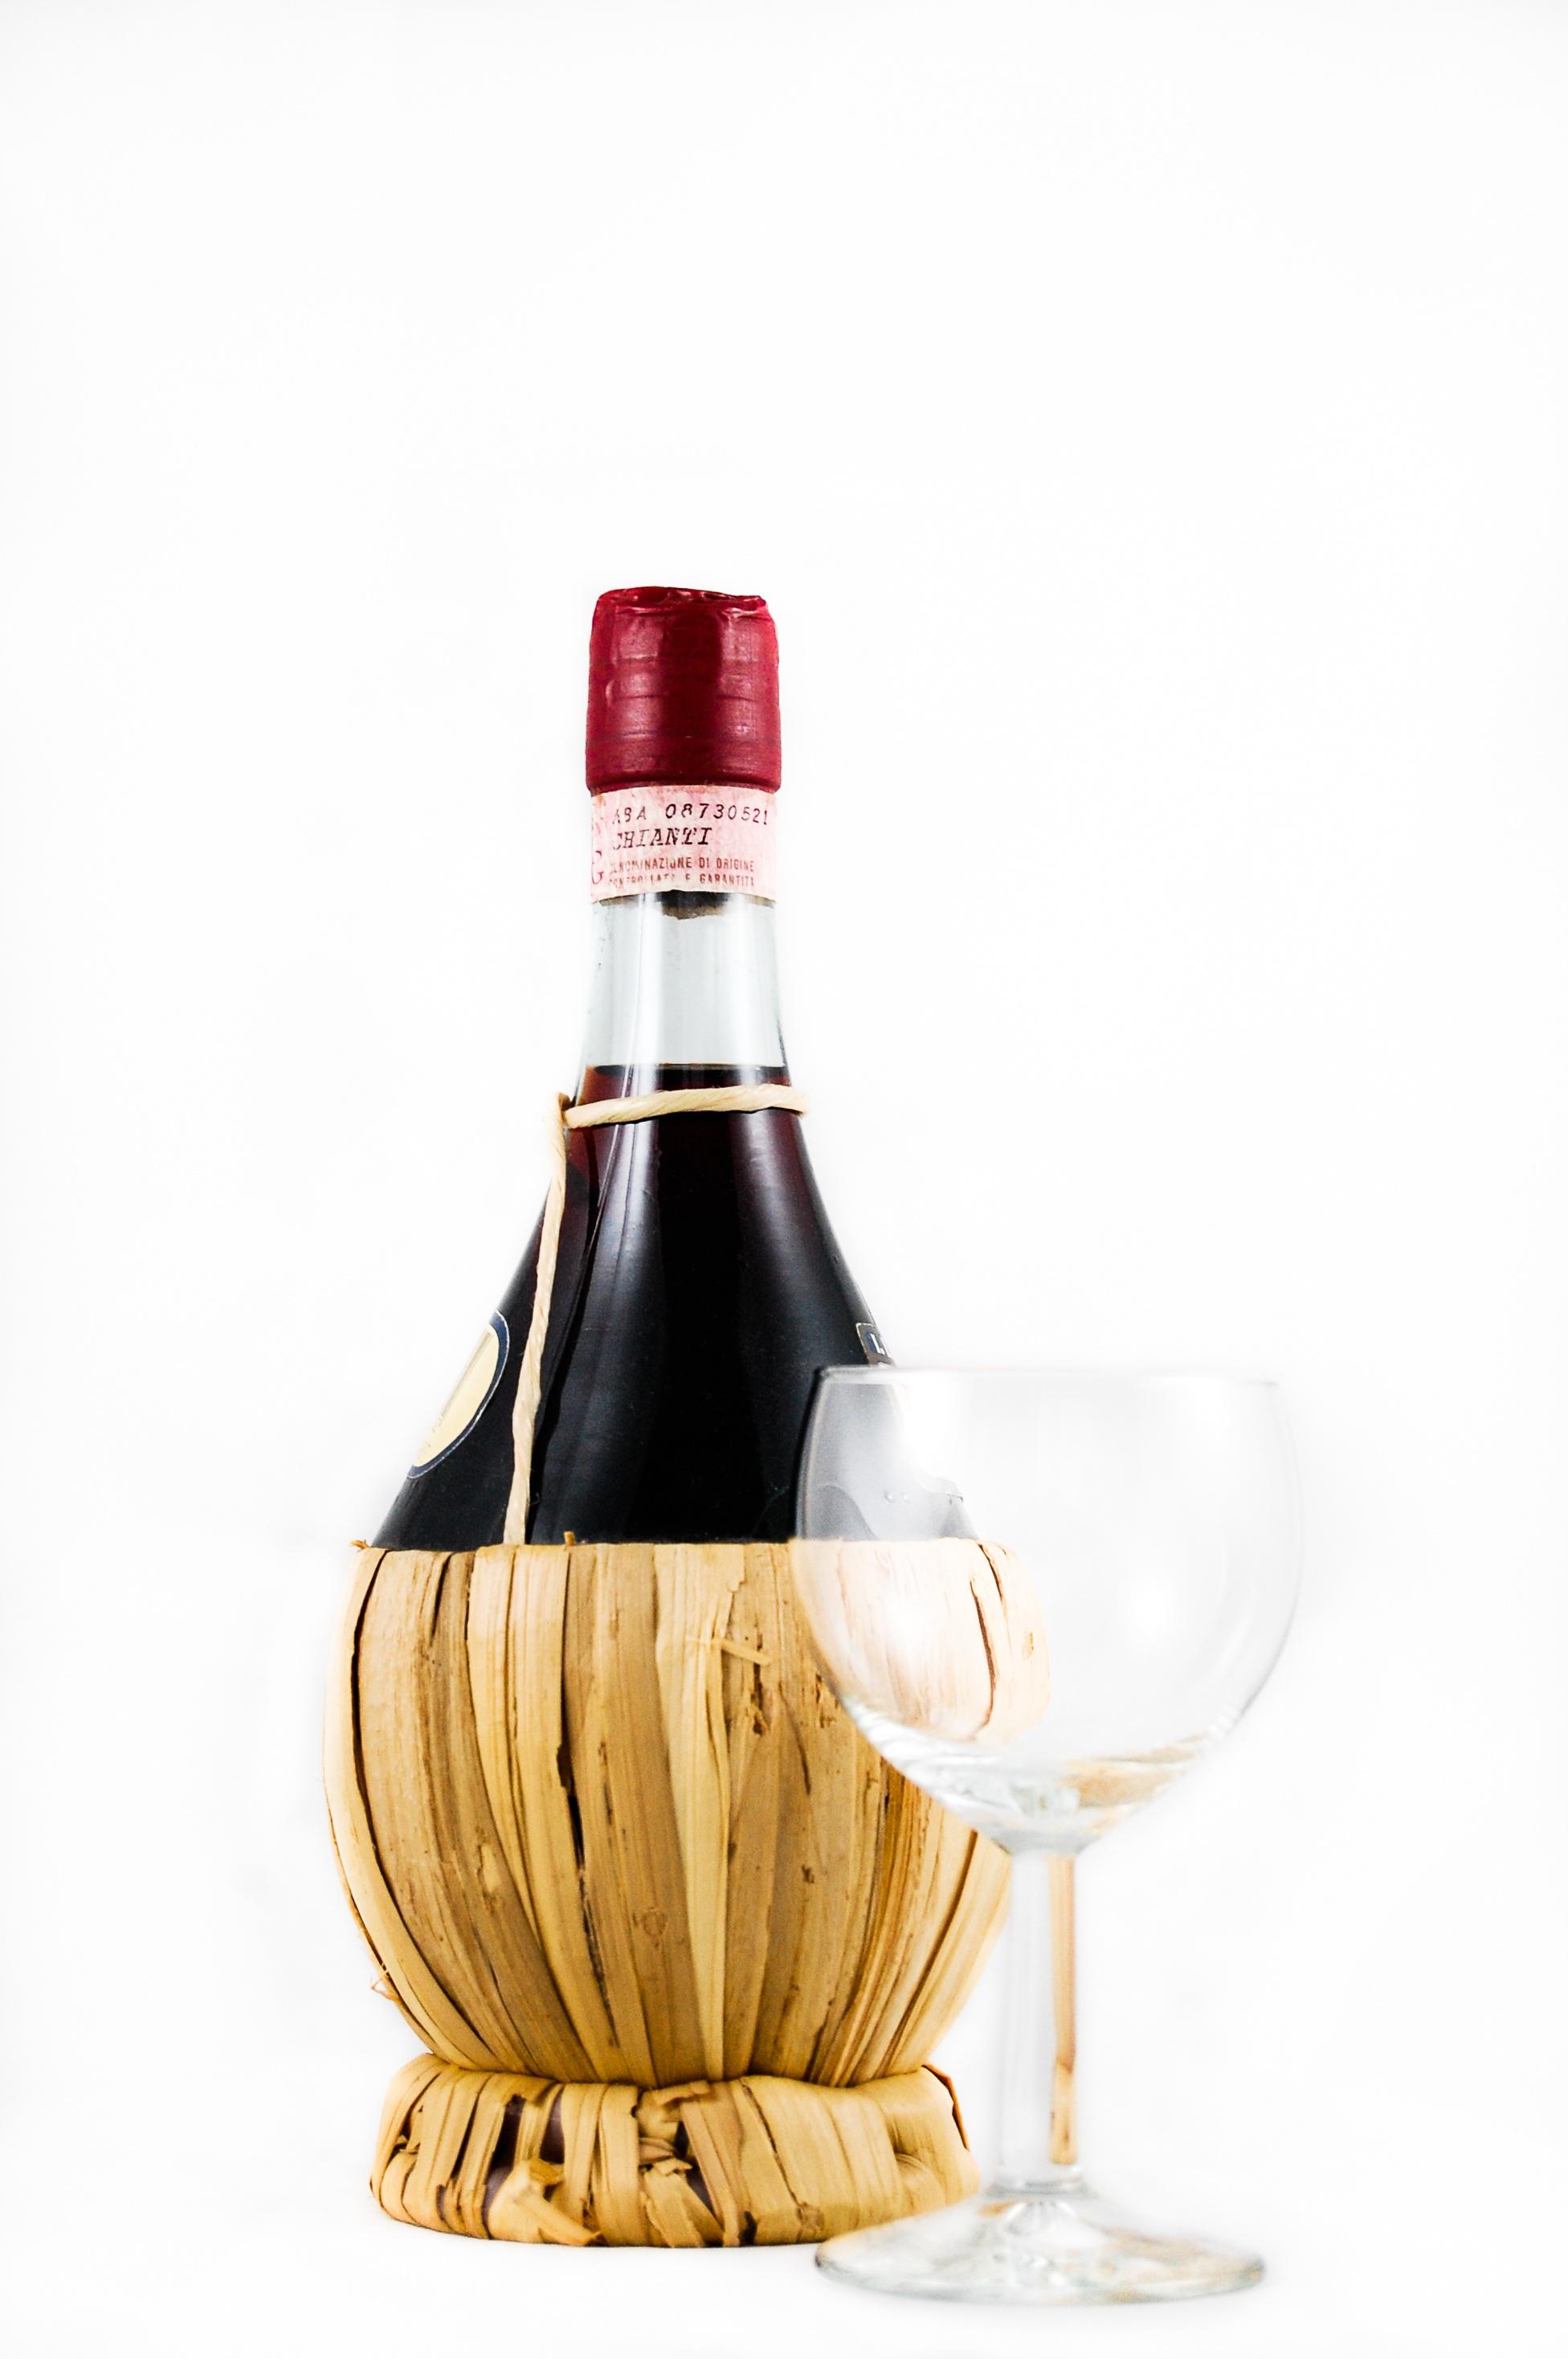 Clear wine glass beside red wine bottle free stock photo for Wine bottle glass